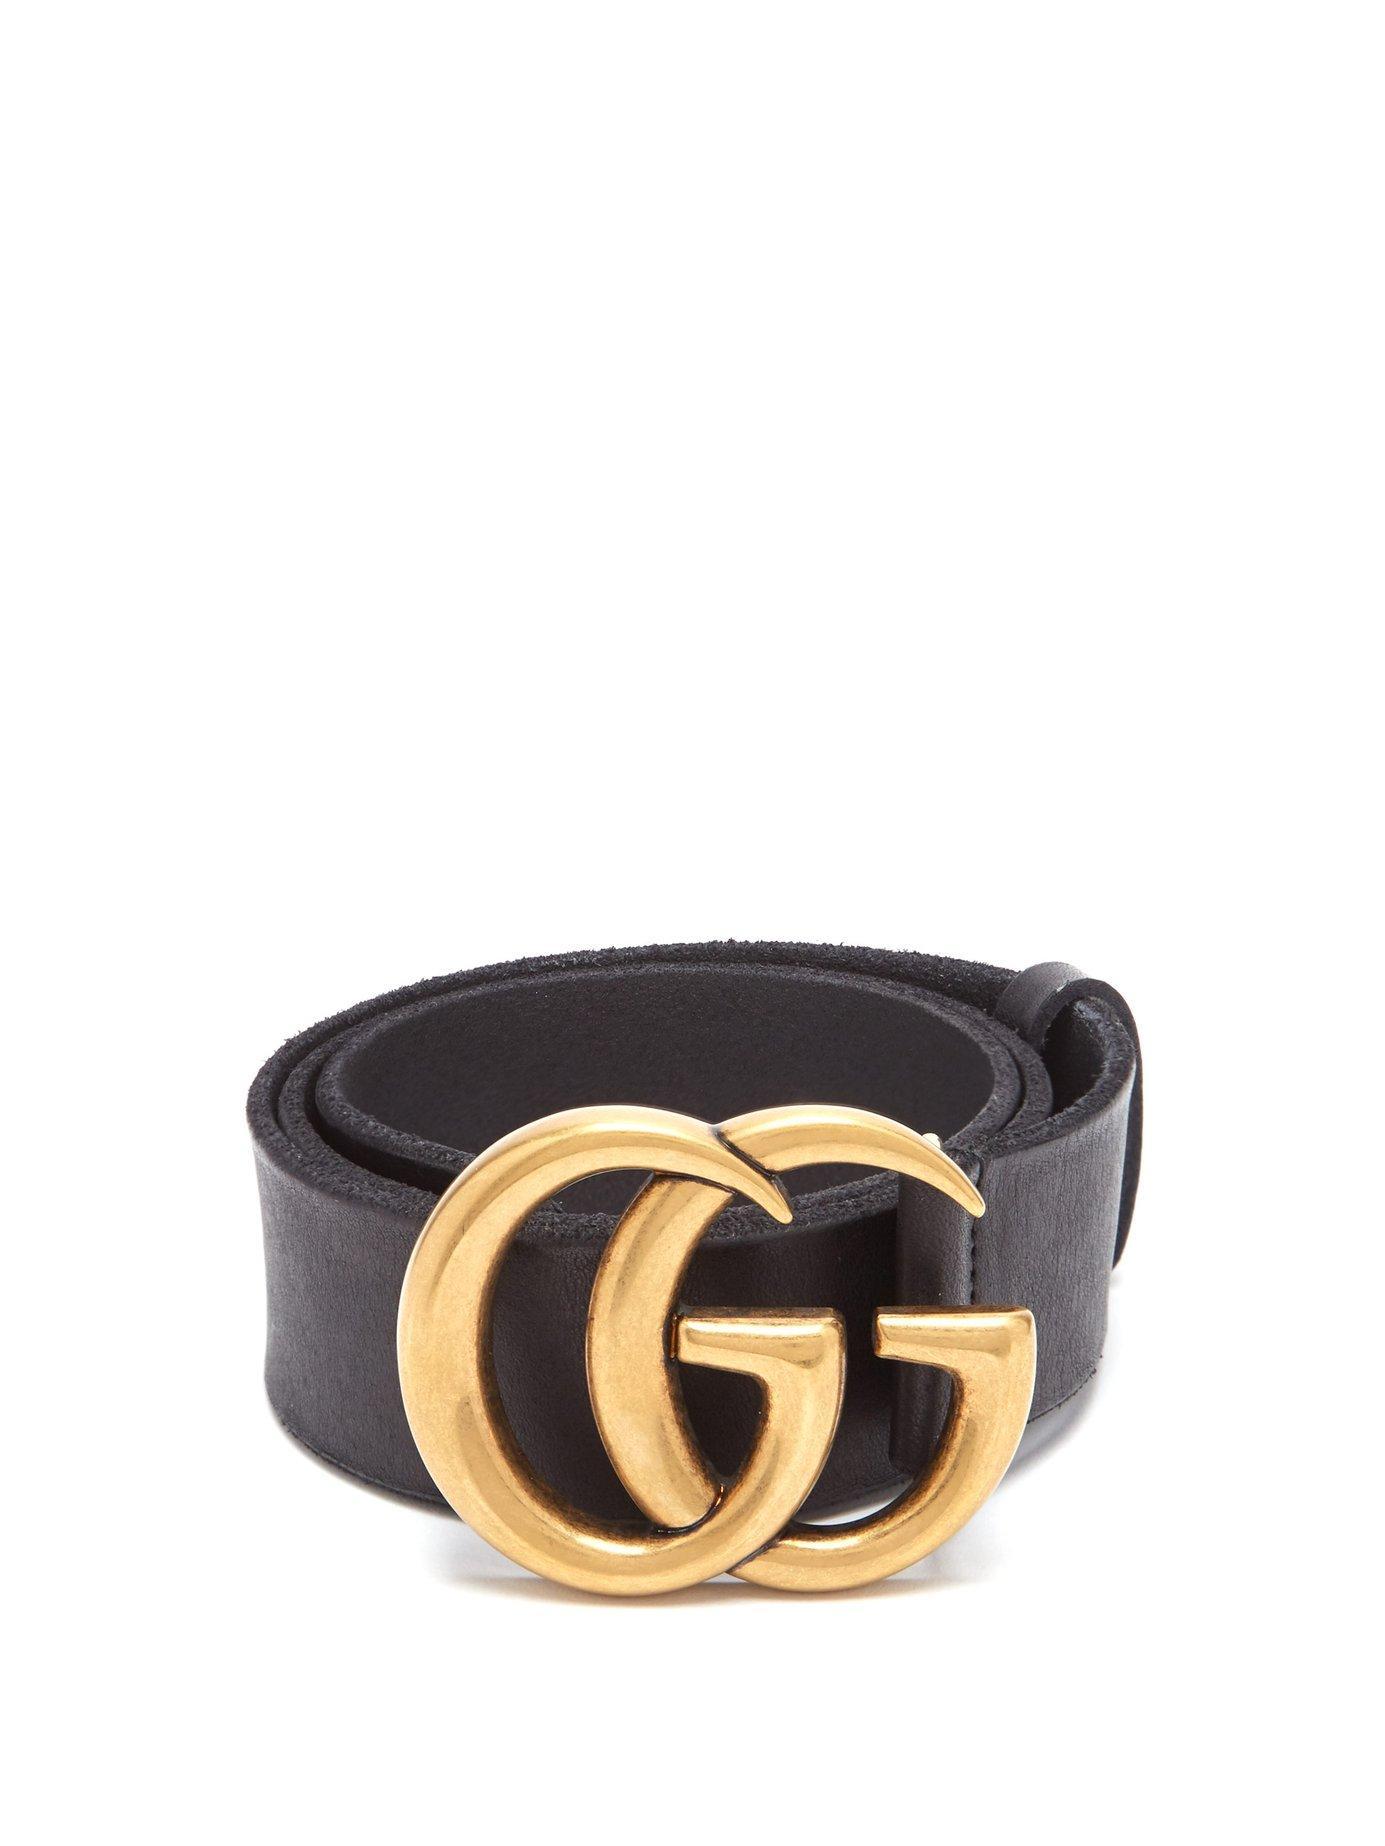 261ecae7fcf Gucci Gg Logo Leather Belt in Black - Lyst